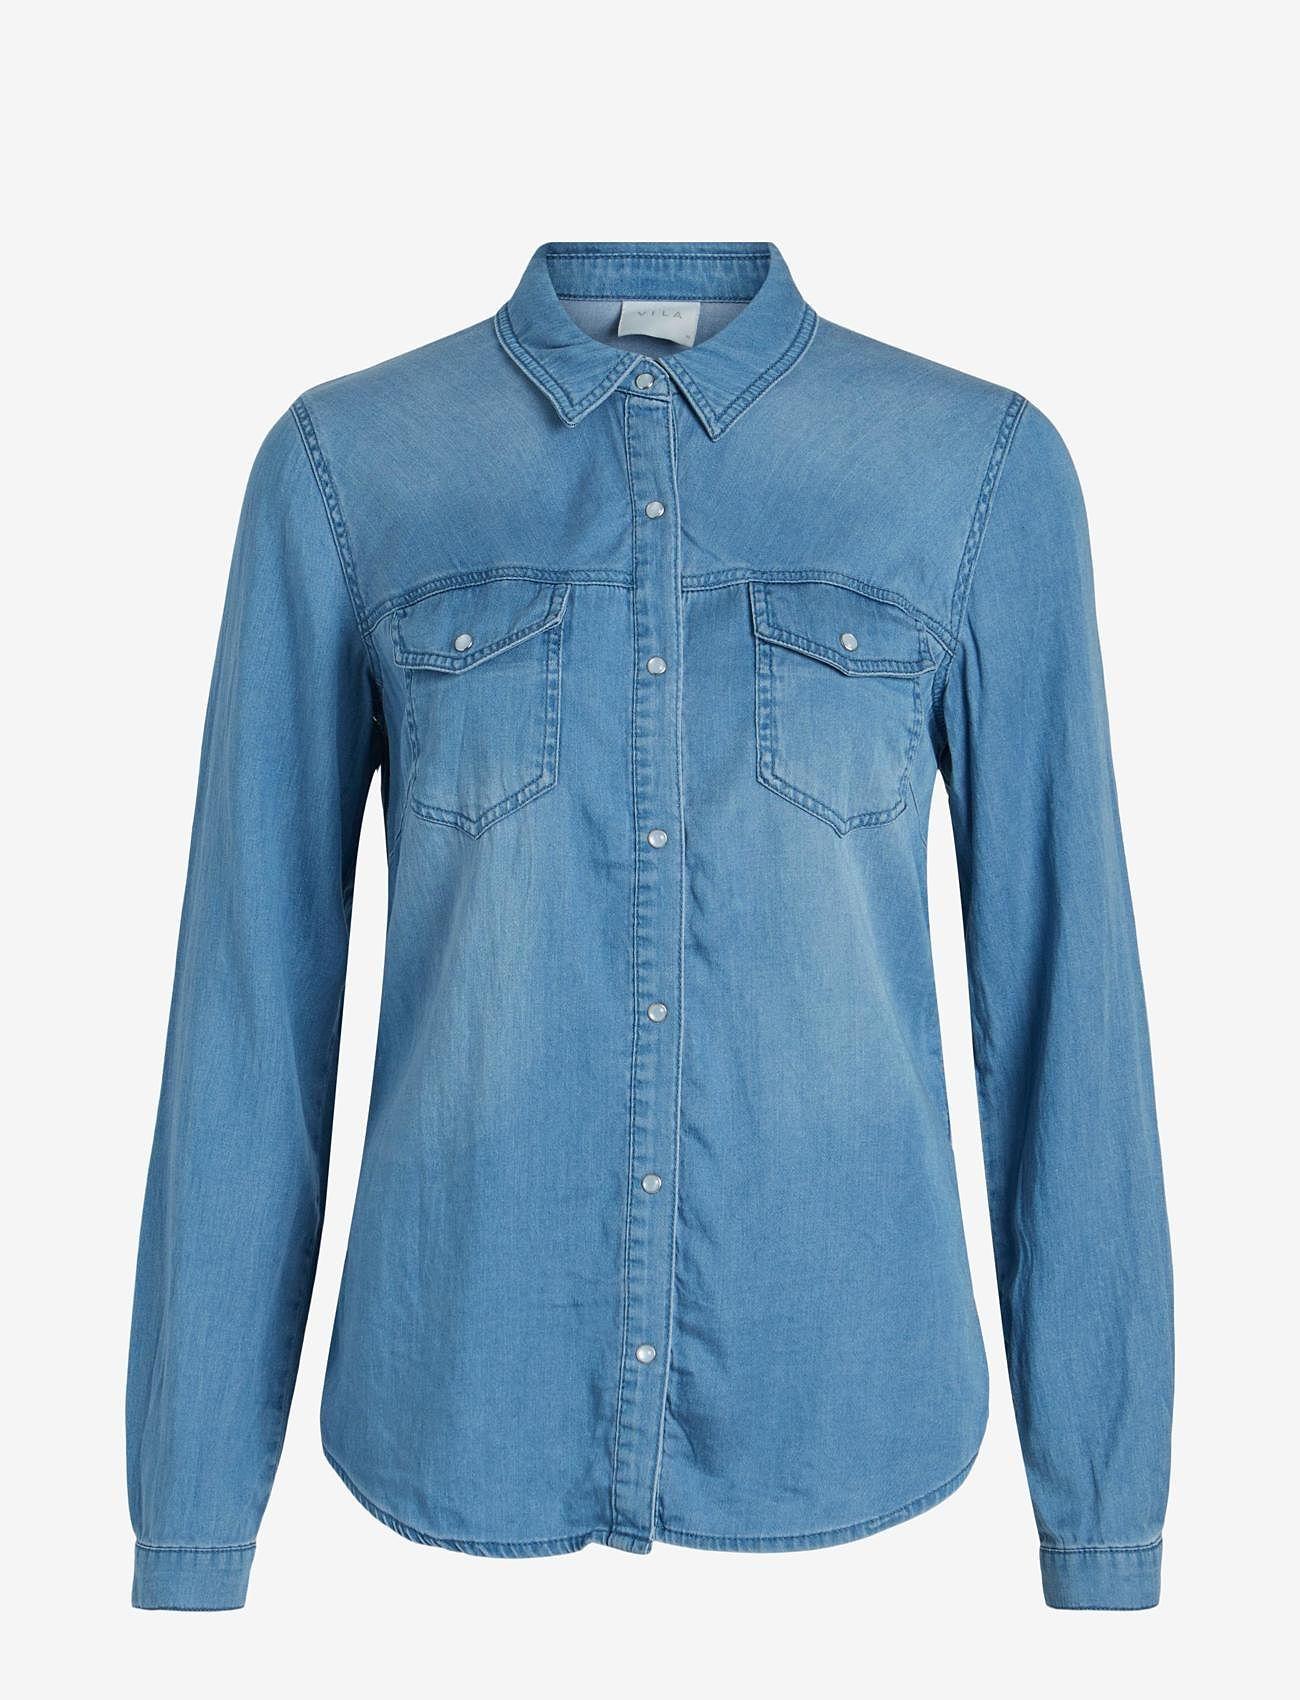 Vila - VIBISTA DENIM SHIRT/SU-NOOS - long-sleeved shirts - medium blue denim - 0